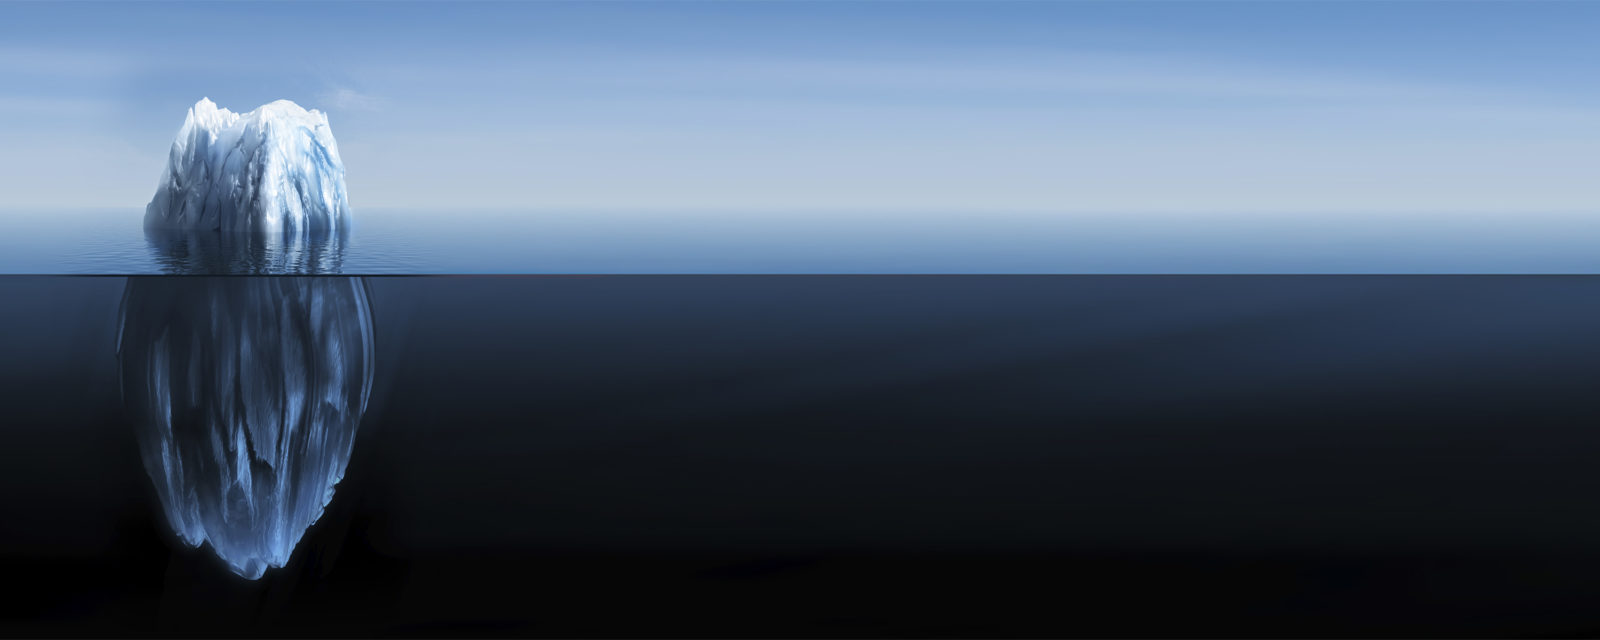 Iceberg - Wide